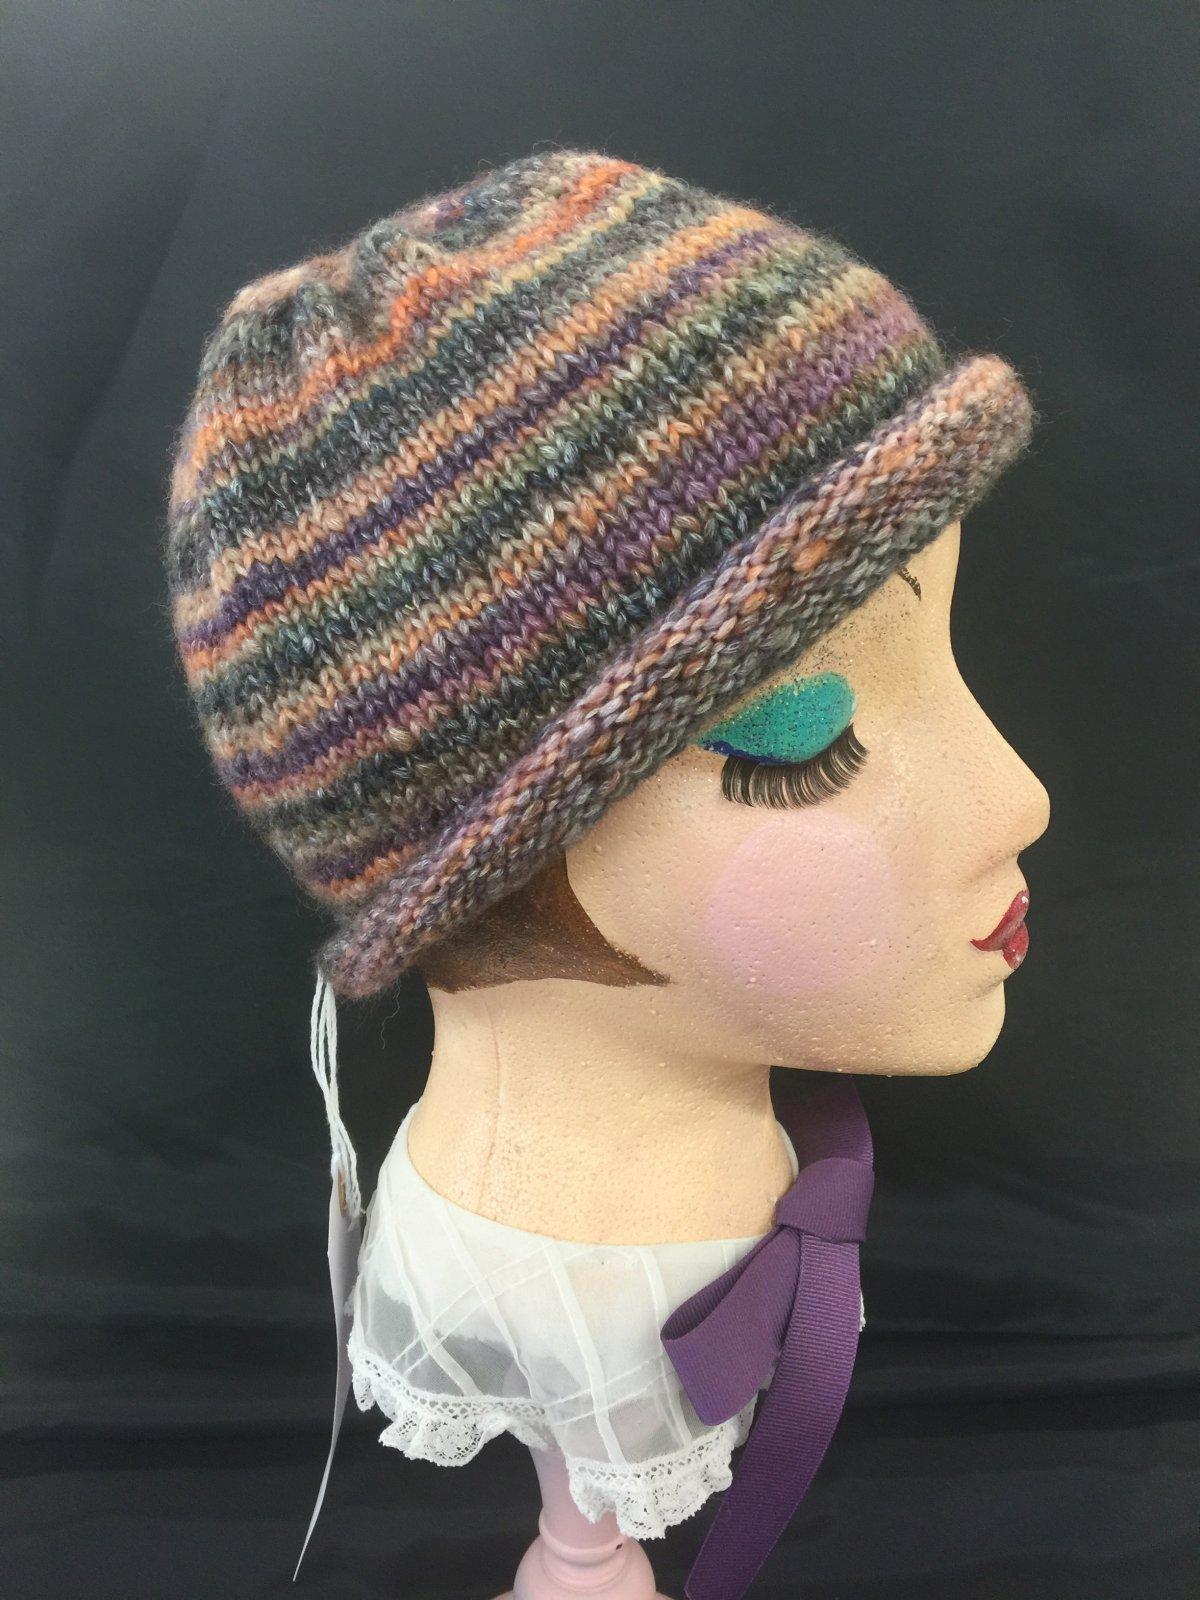 Bremerton-Knit Fabulous Hats on Circular Needles (3 days) 3c85a3c60e8